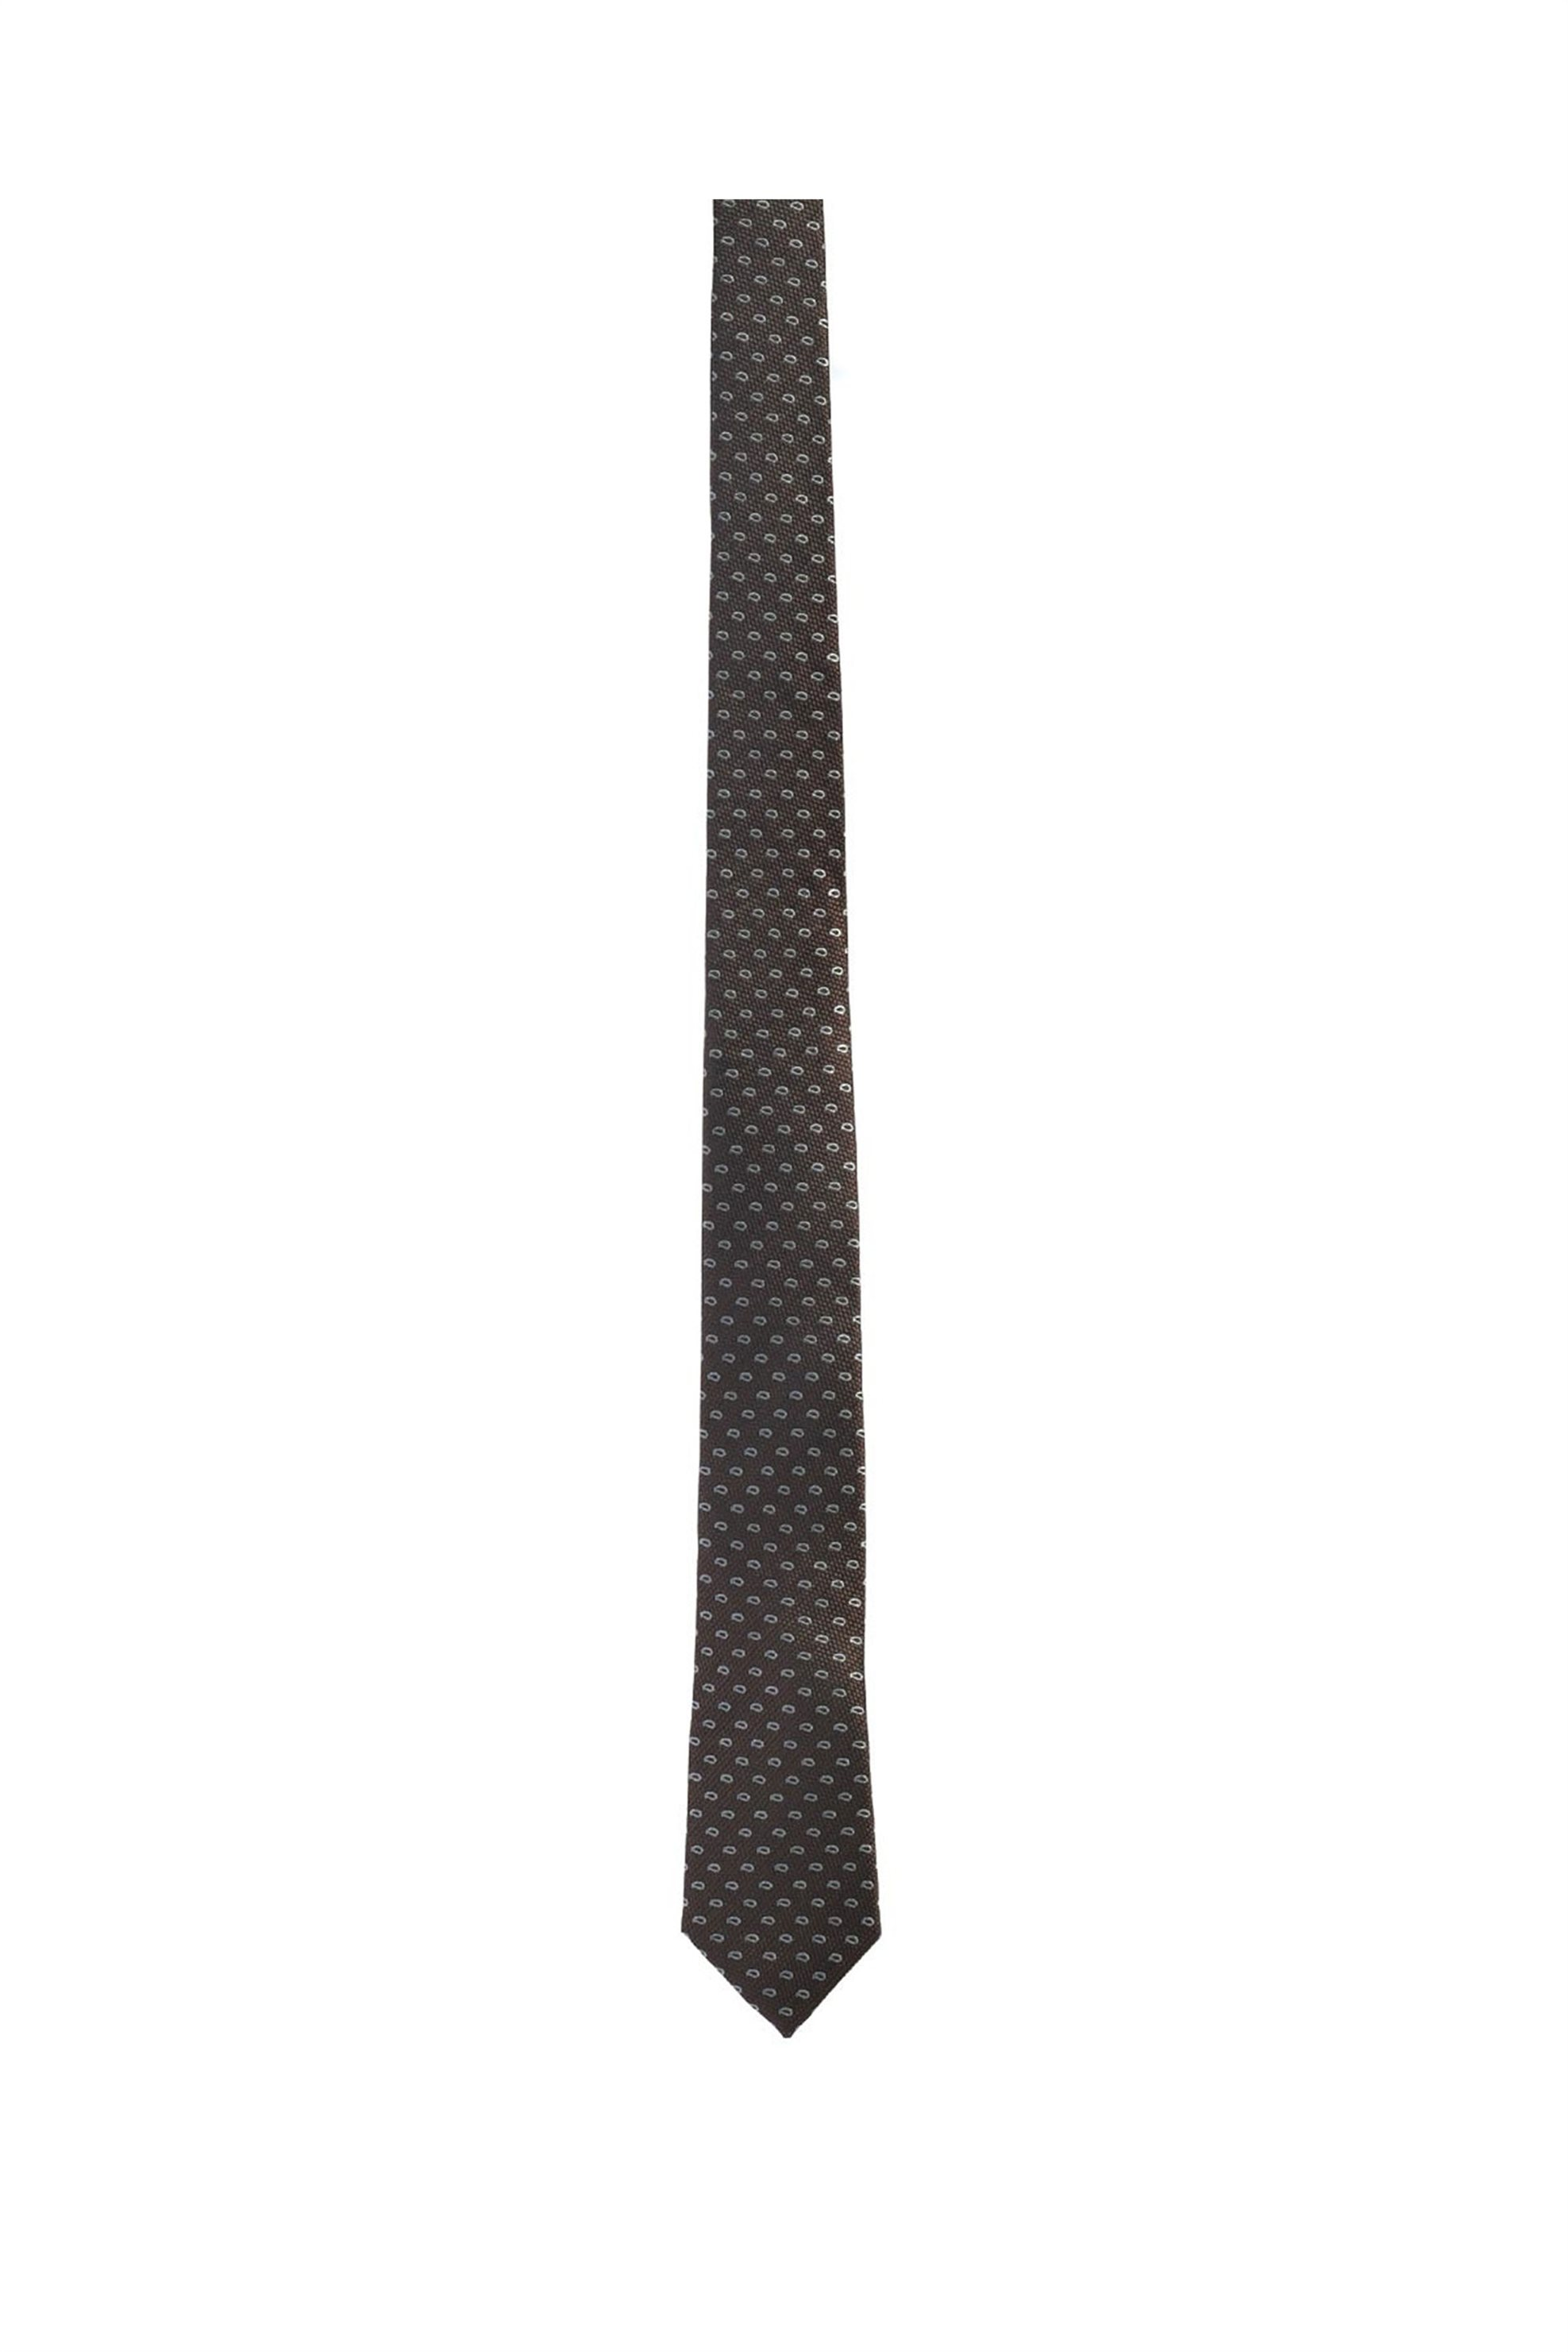 Vardas ανδρική μεταξωτή γραβάτα ''Retro Style Twill'' - 2052005361907 - Καφέ